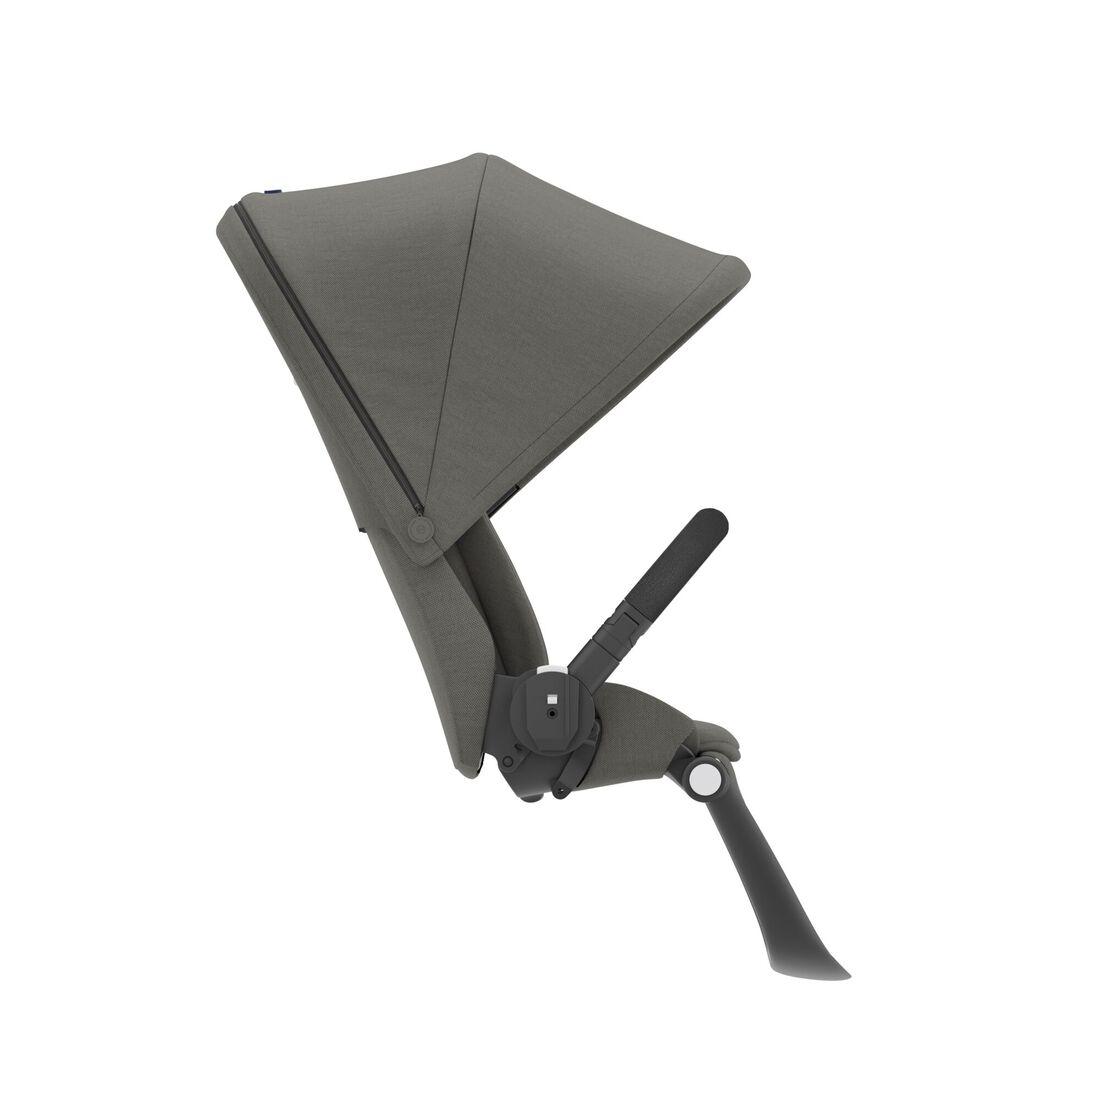 CYBEX Gazelle S Seat Unit - Soho Grey (Black Frame) in Soho Grey (Black Frame) large image number 2